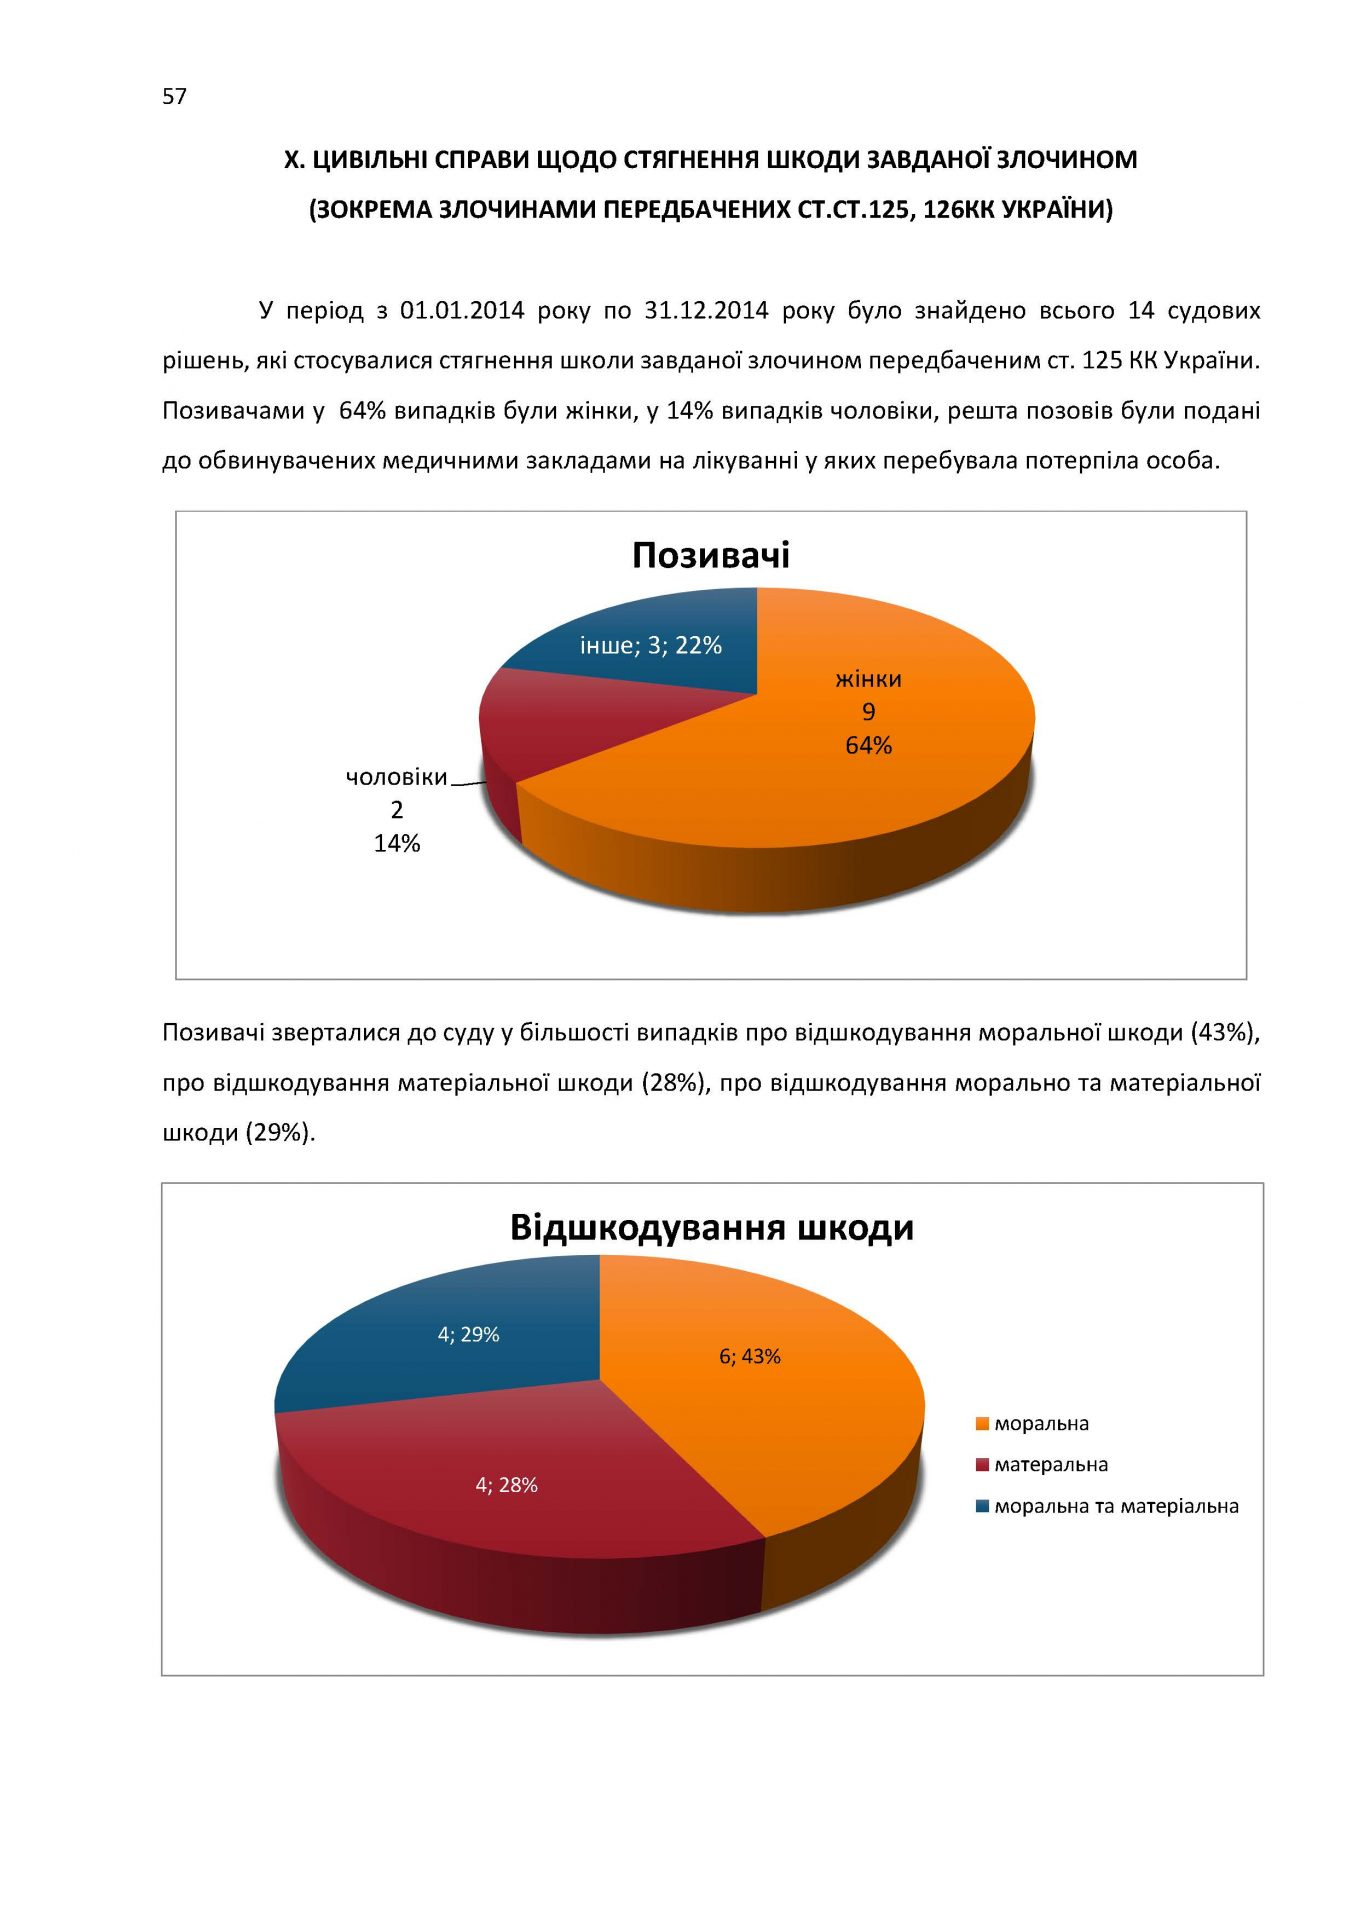 Draft Report monitoring print USAID_Страница_57